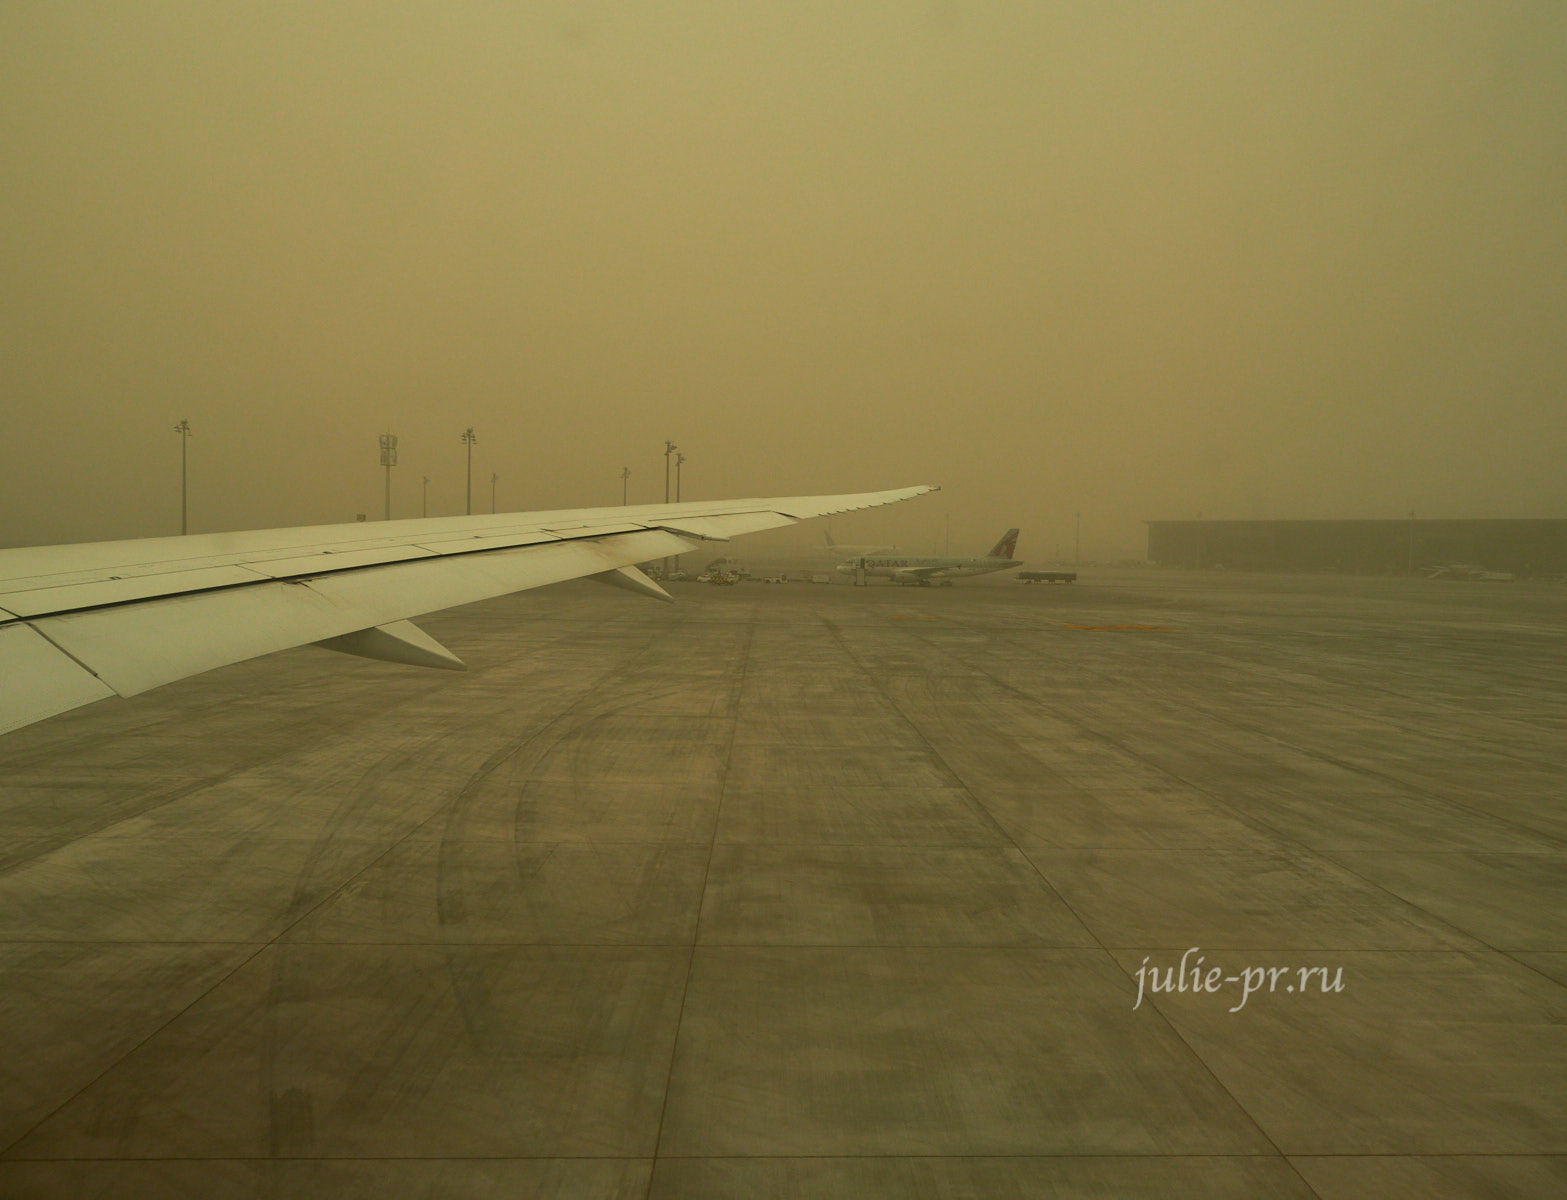 Катар, Доха, аэропорт, песок в воздухе